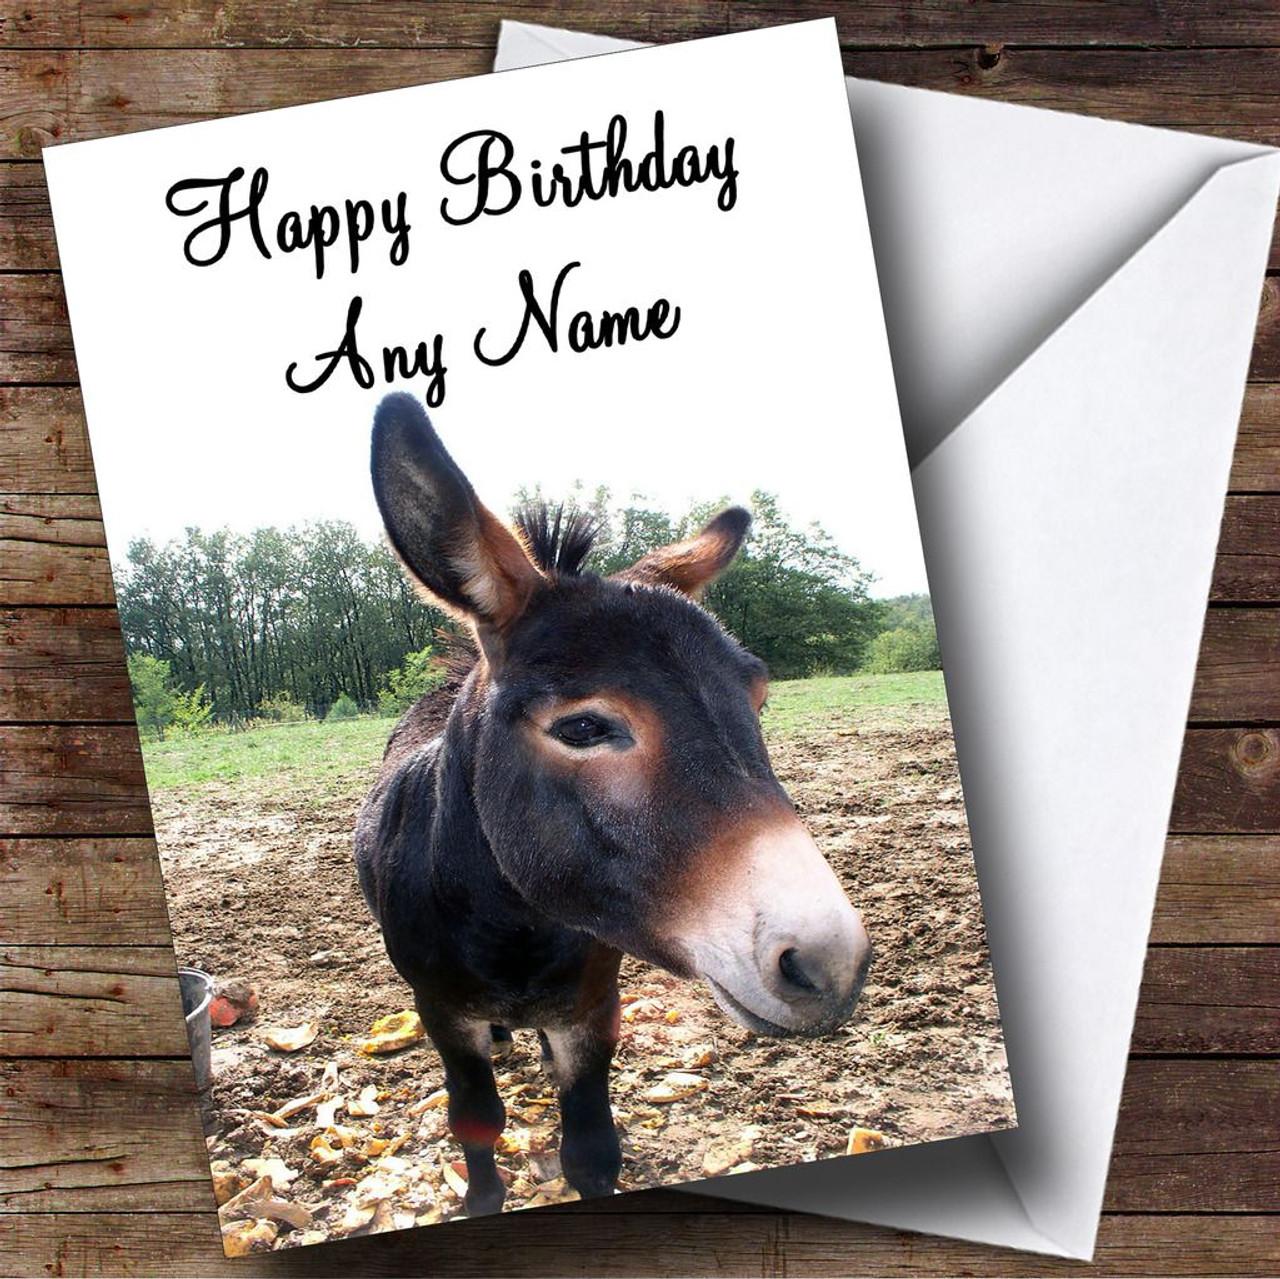 Donkey Personalised Birthday Card The Card Zoo – Donkey Birthday Card